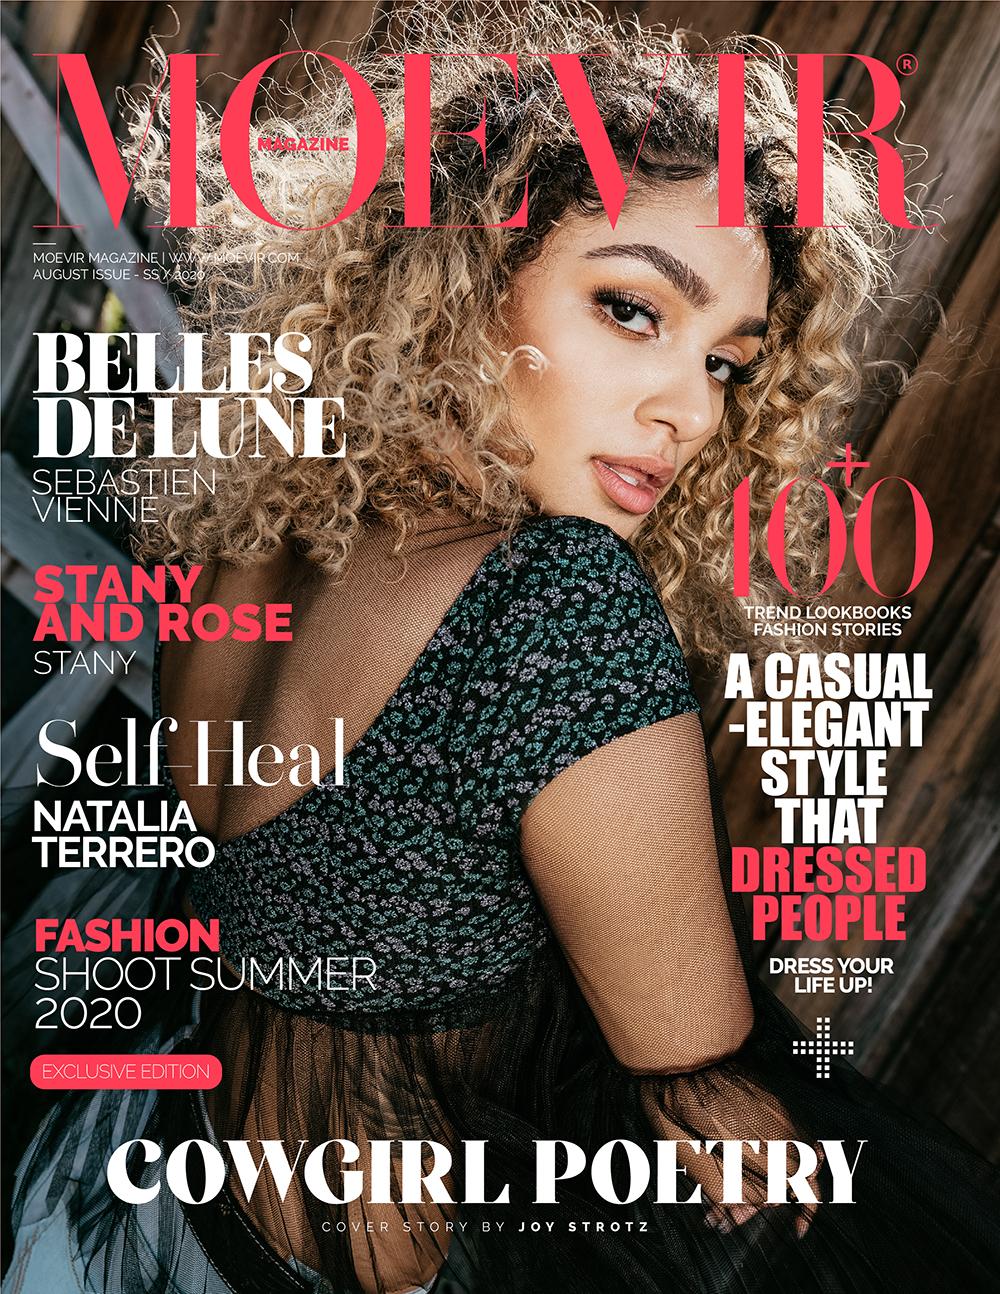 Moevir Magazine August Issue